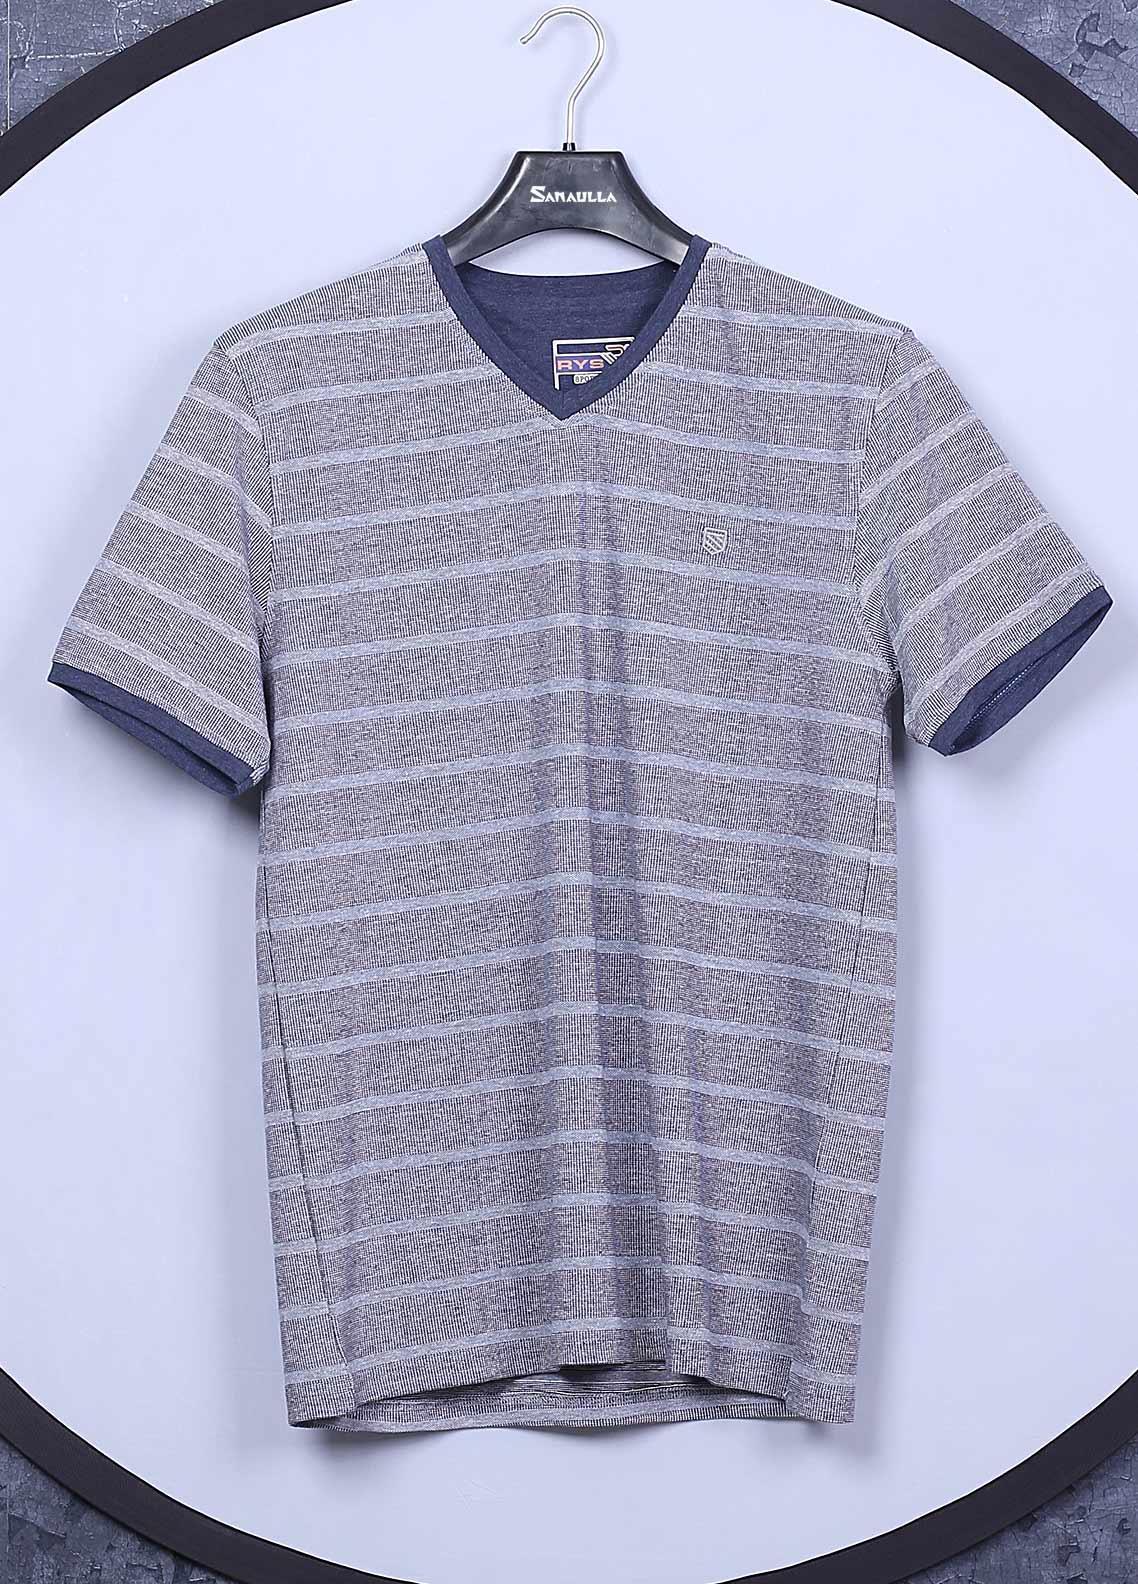 Sanaulla Exclusive Range Cotton Casual Mens T-Shirts -  5407 Light Grey